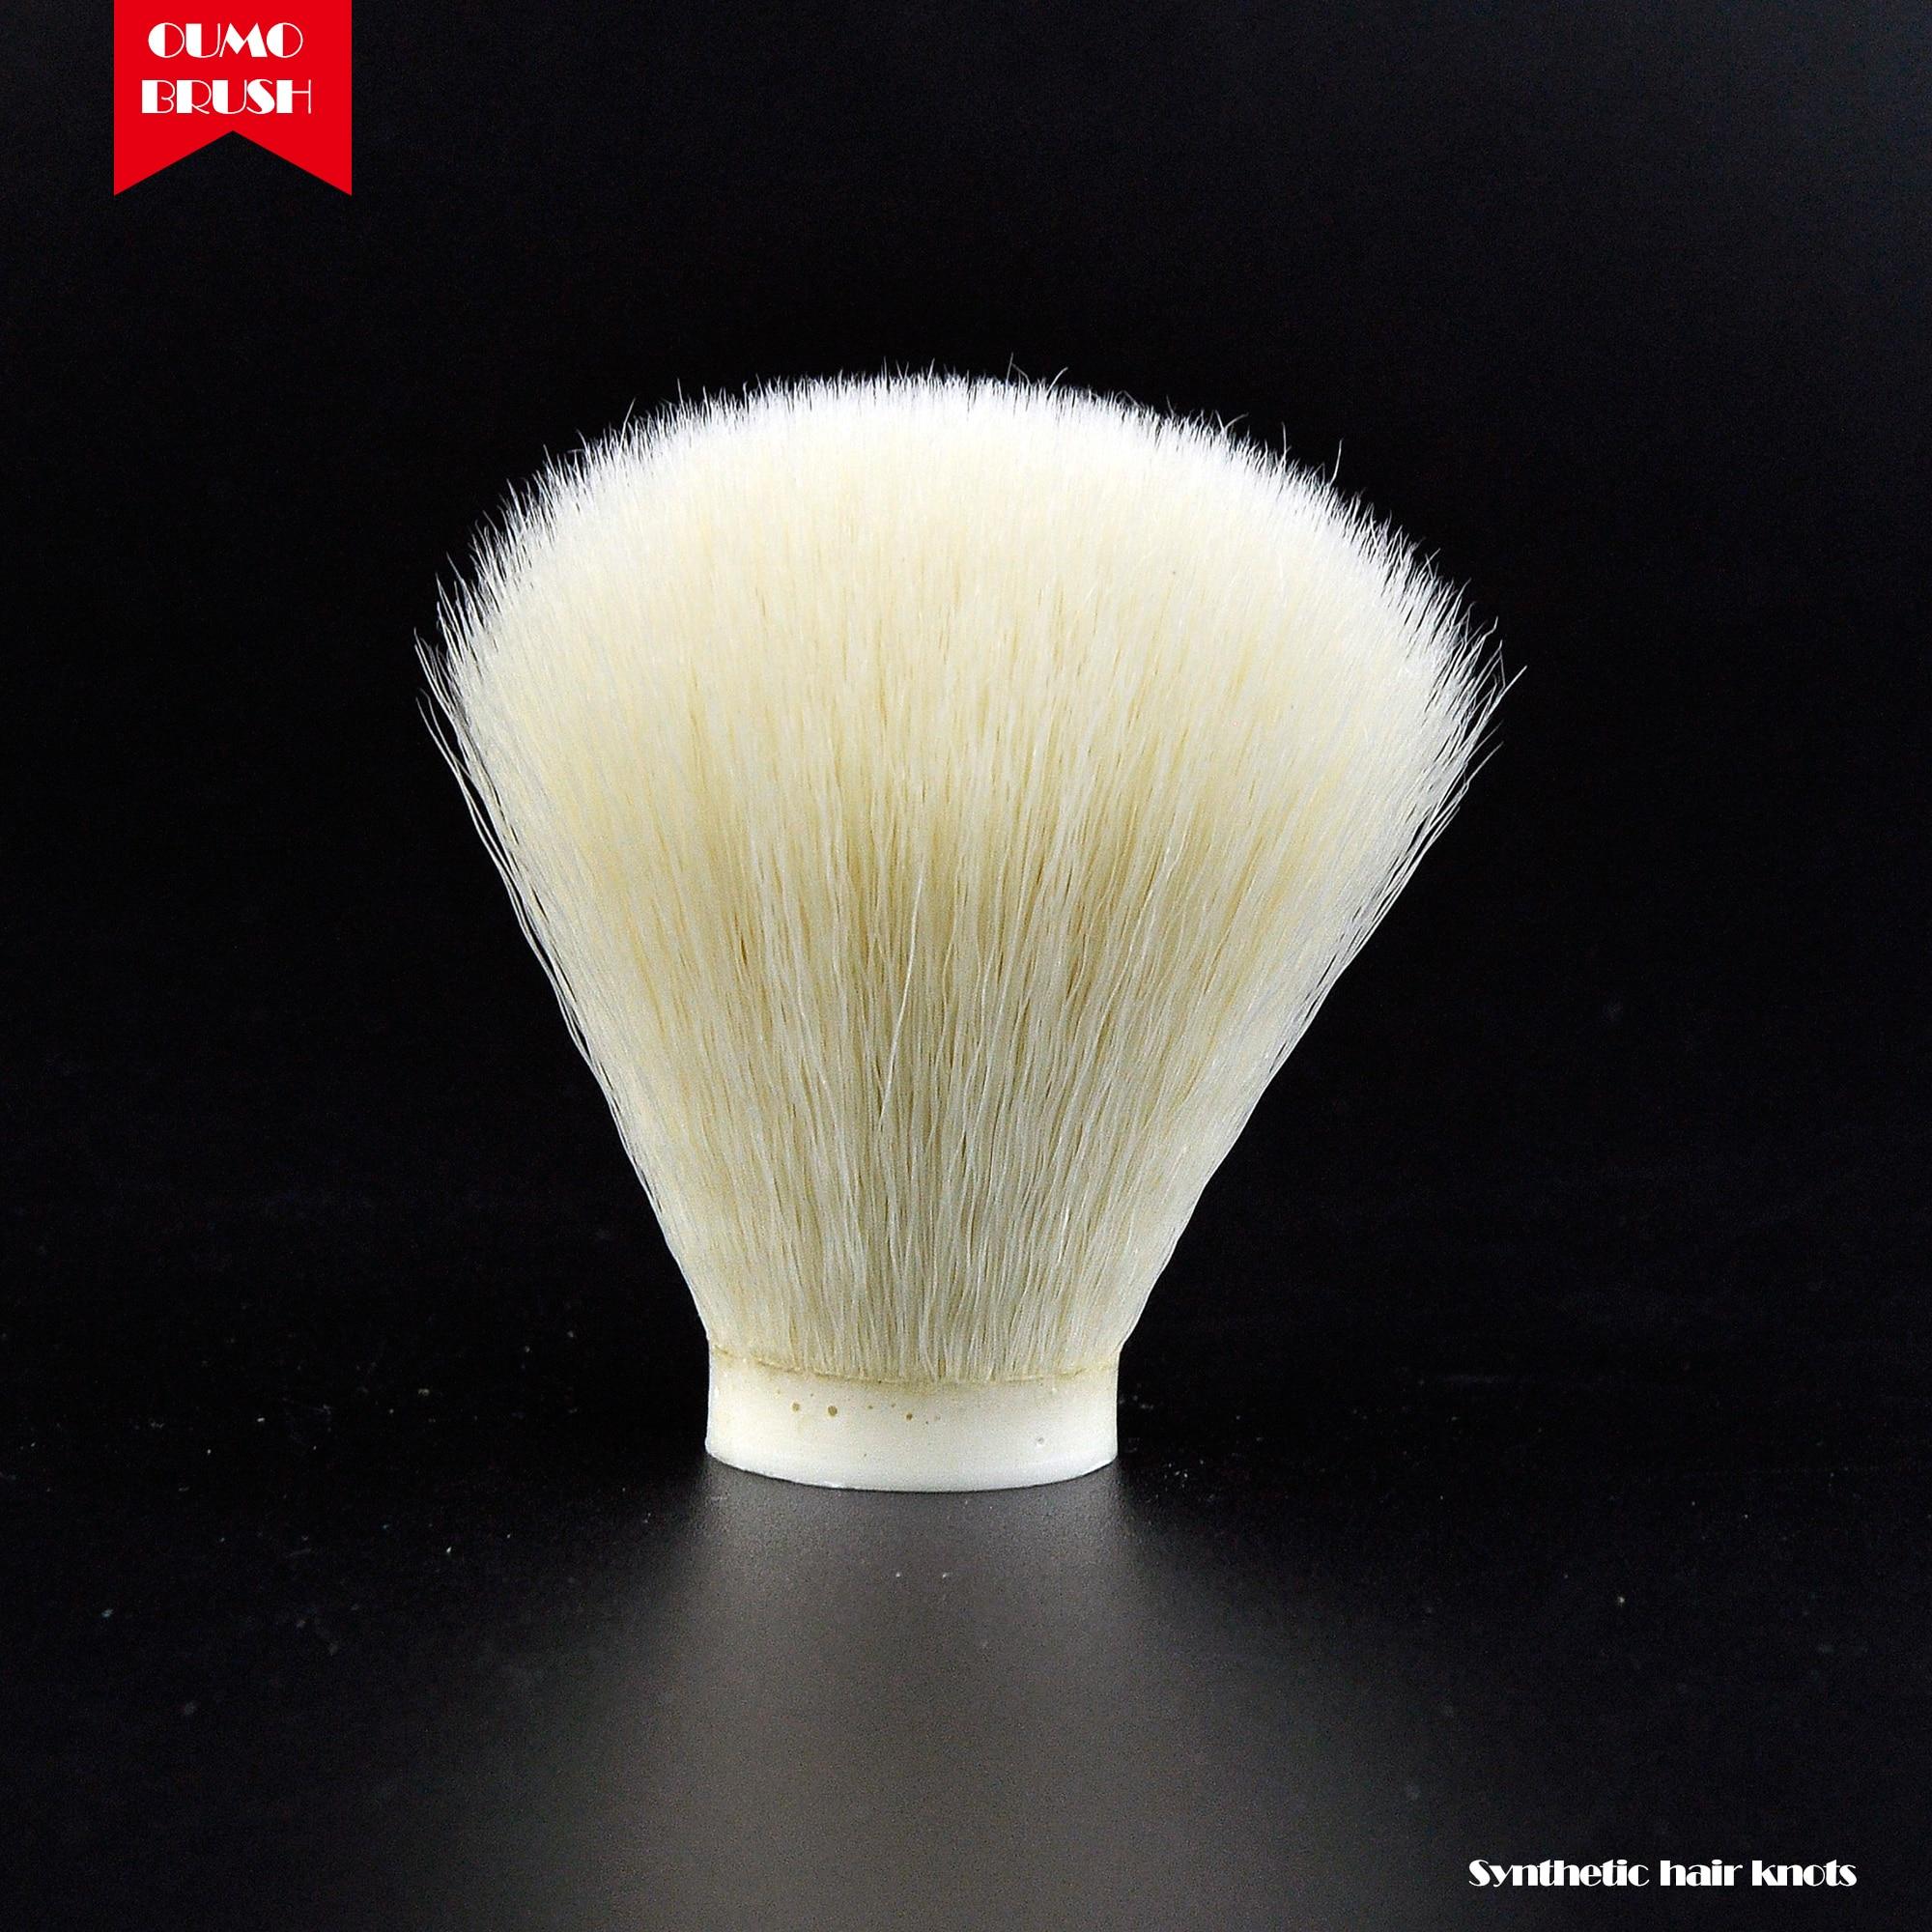 OUMO BRUSH-cream White Synthetic Hair Knot Shaving Brush Knots